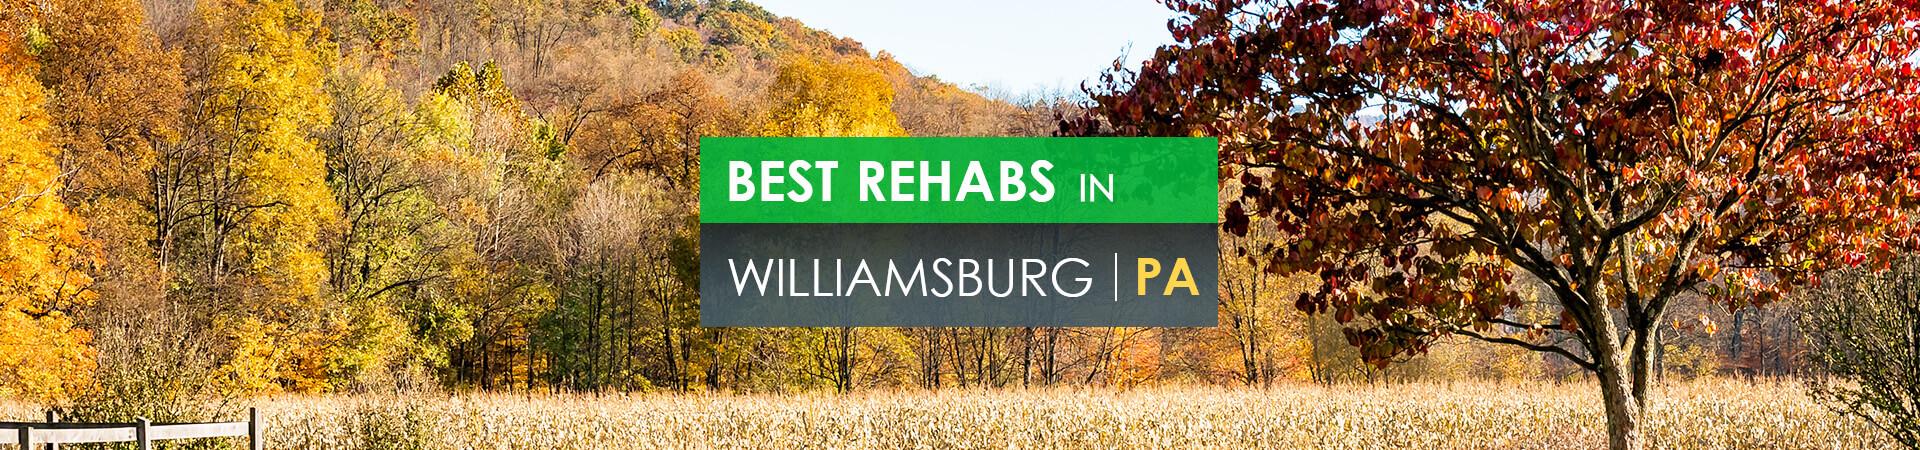 Best rehabs in Williamsburg, PA